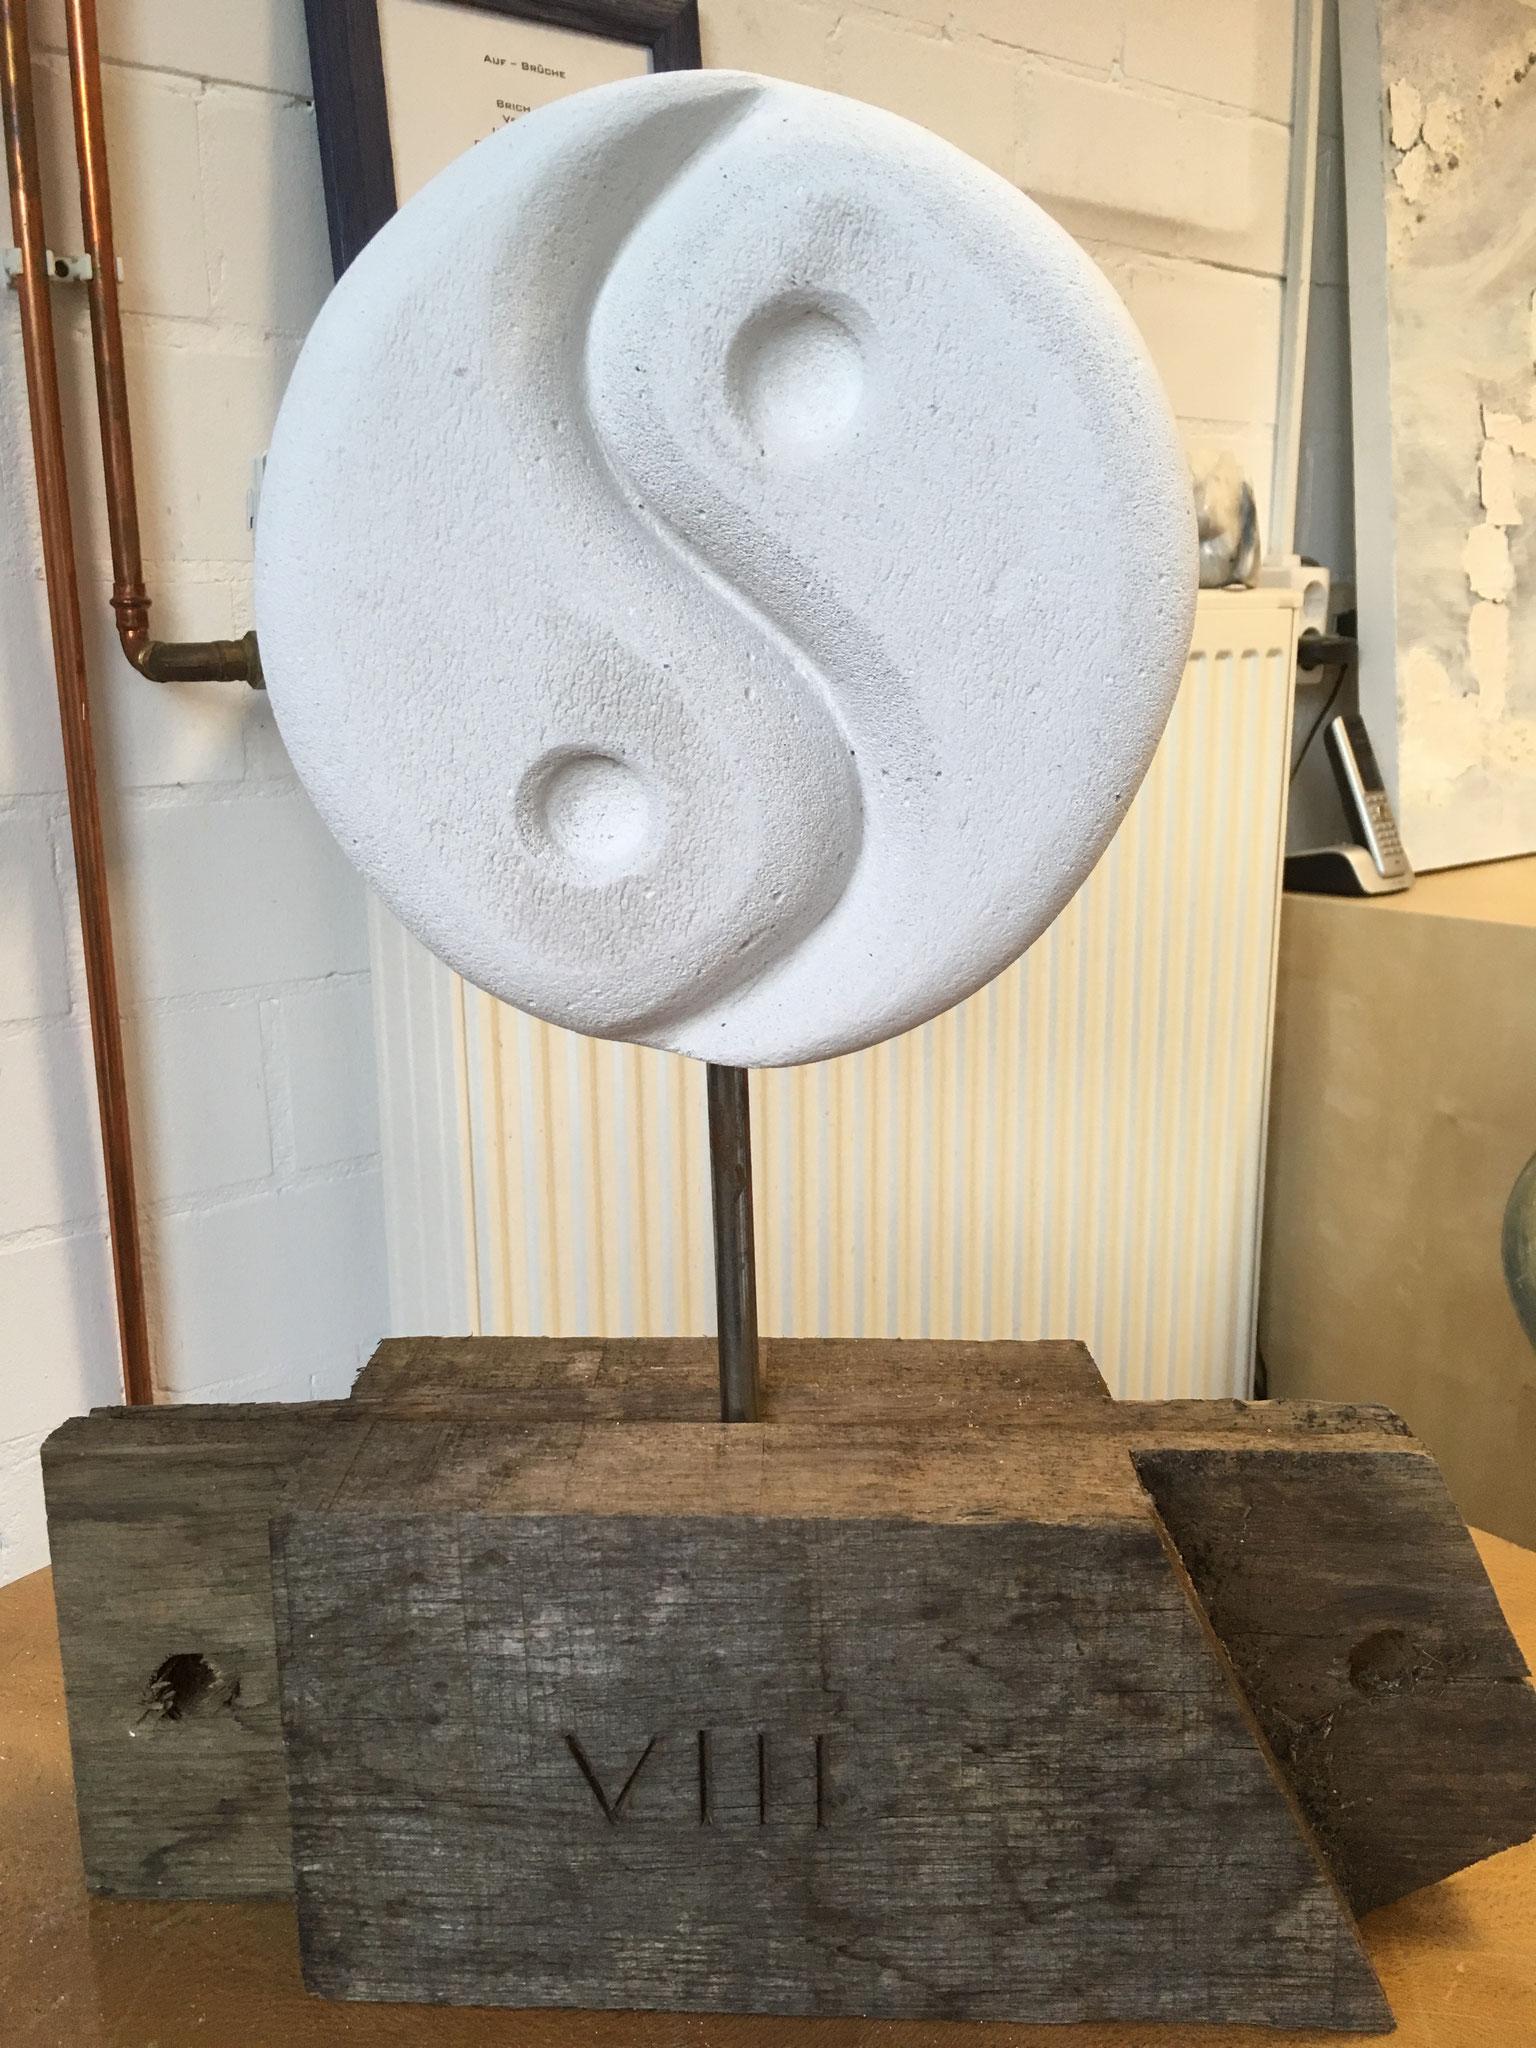 Durchmesser 0.30 m ( Ytong )